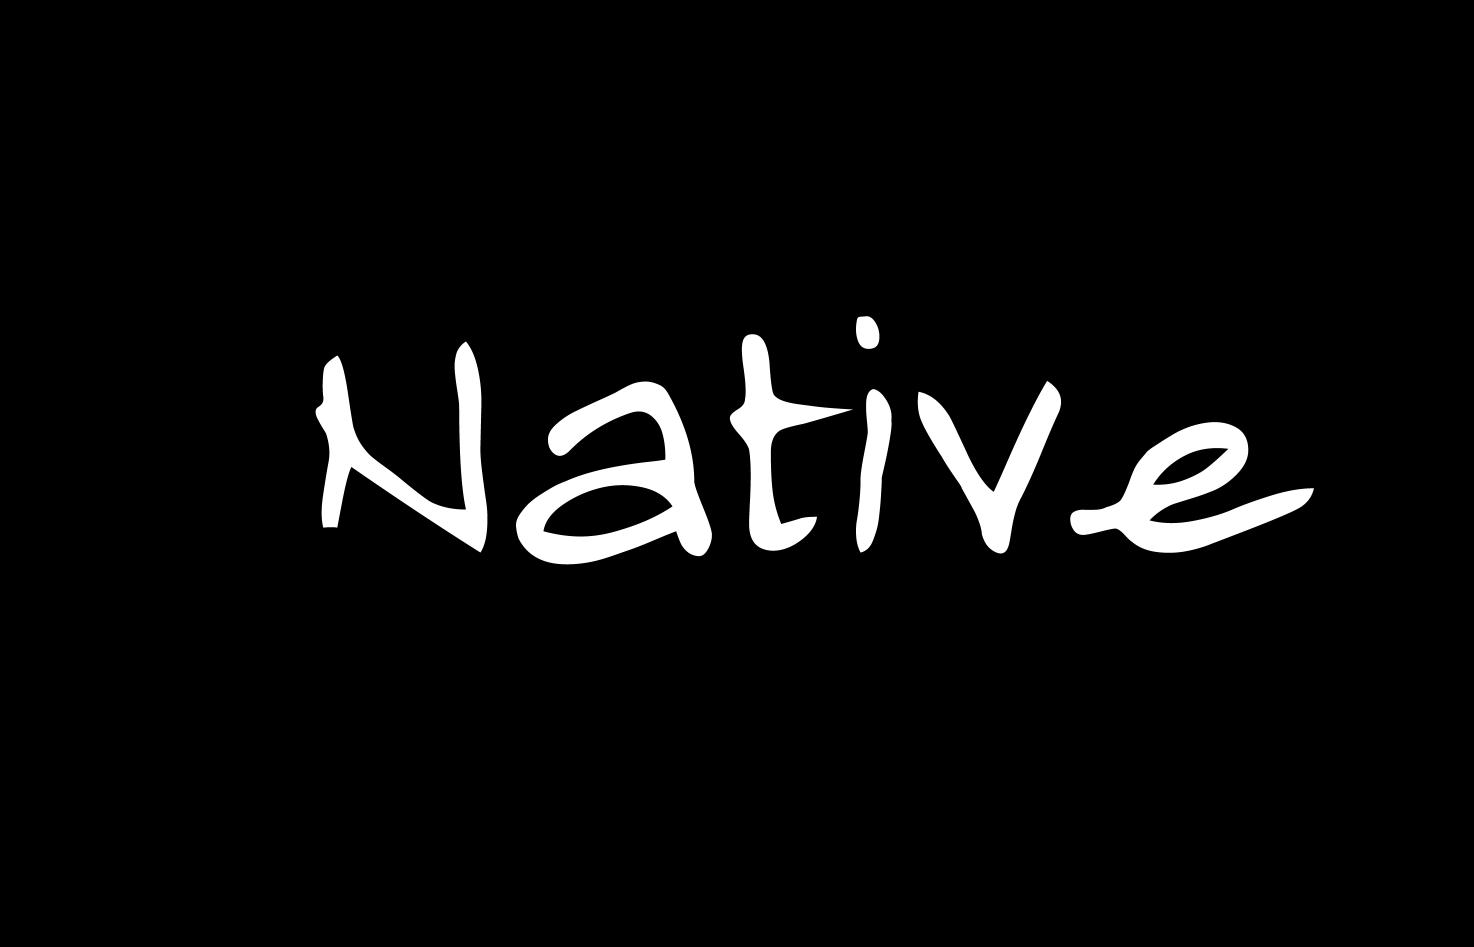 Native ARB